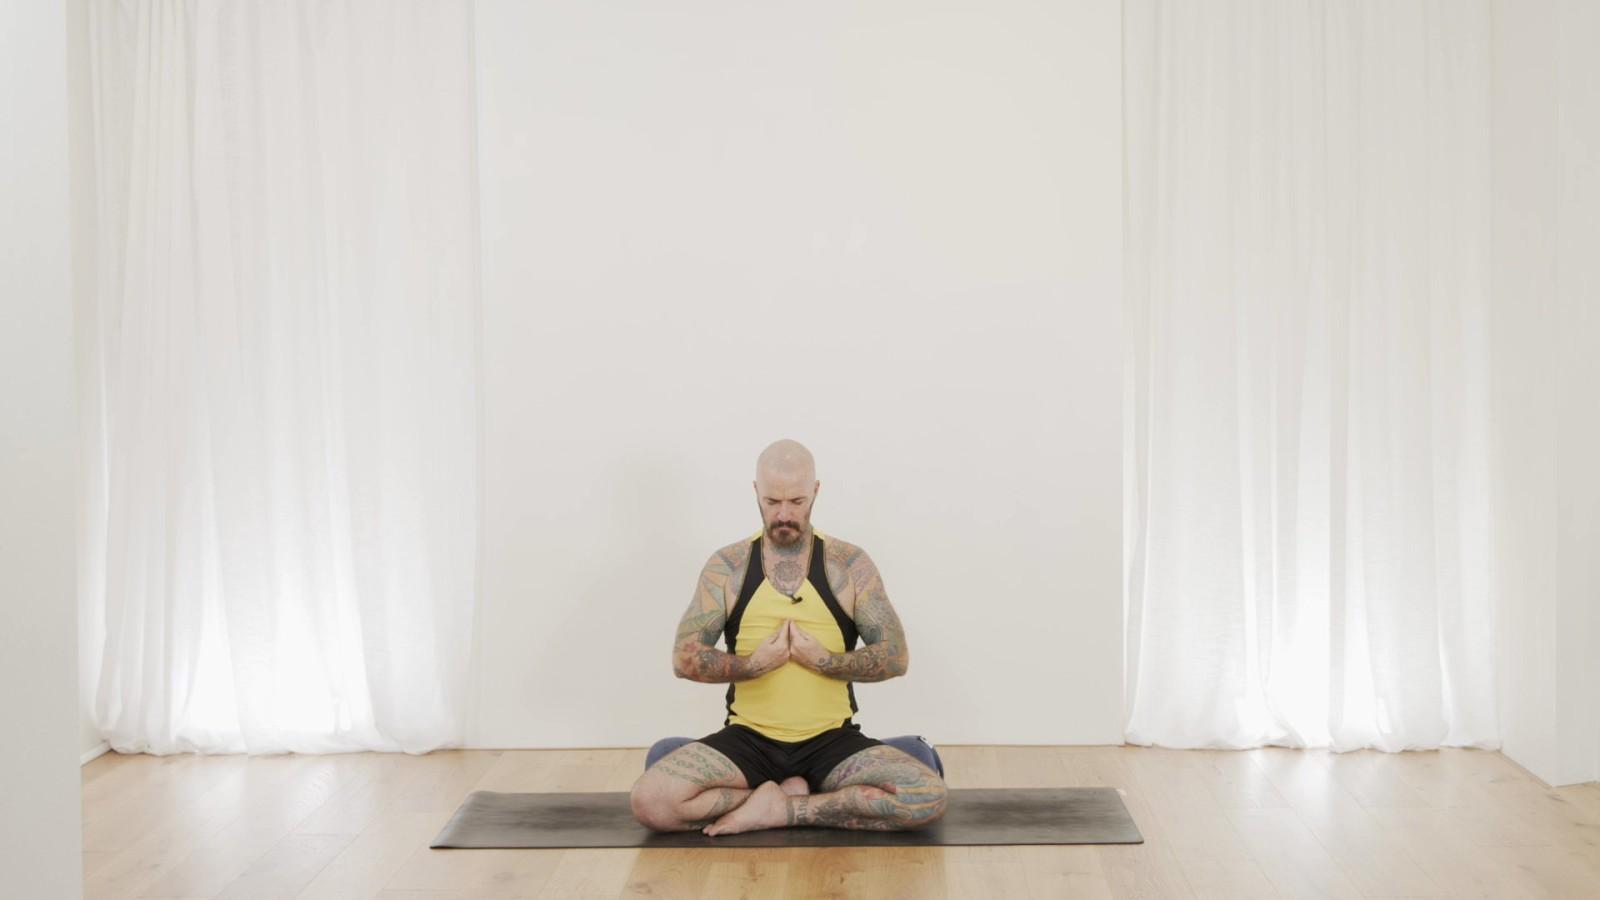 Soma Mudra Vinyasa - Bliss Meditation with Ari Levanael